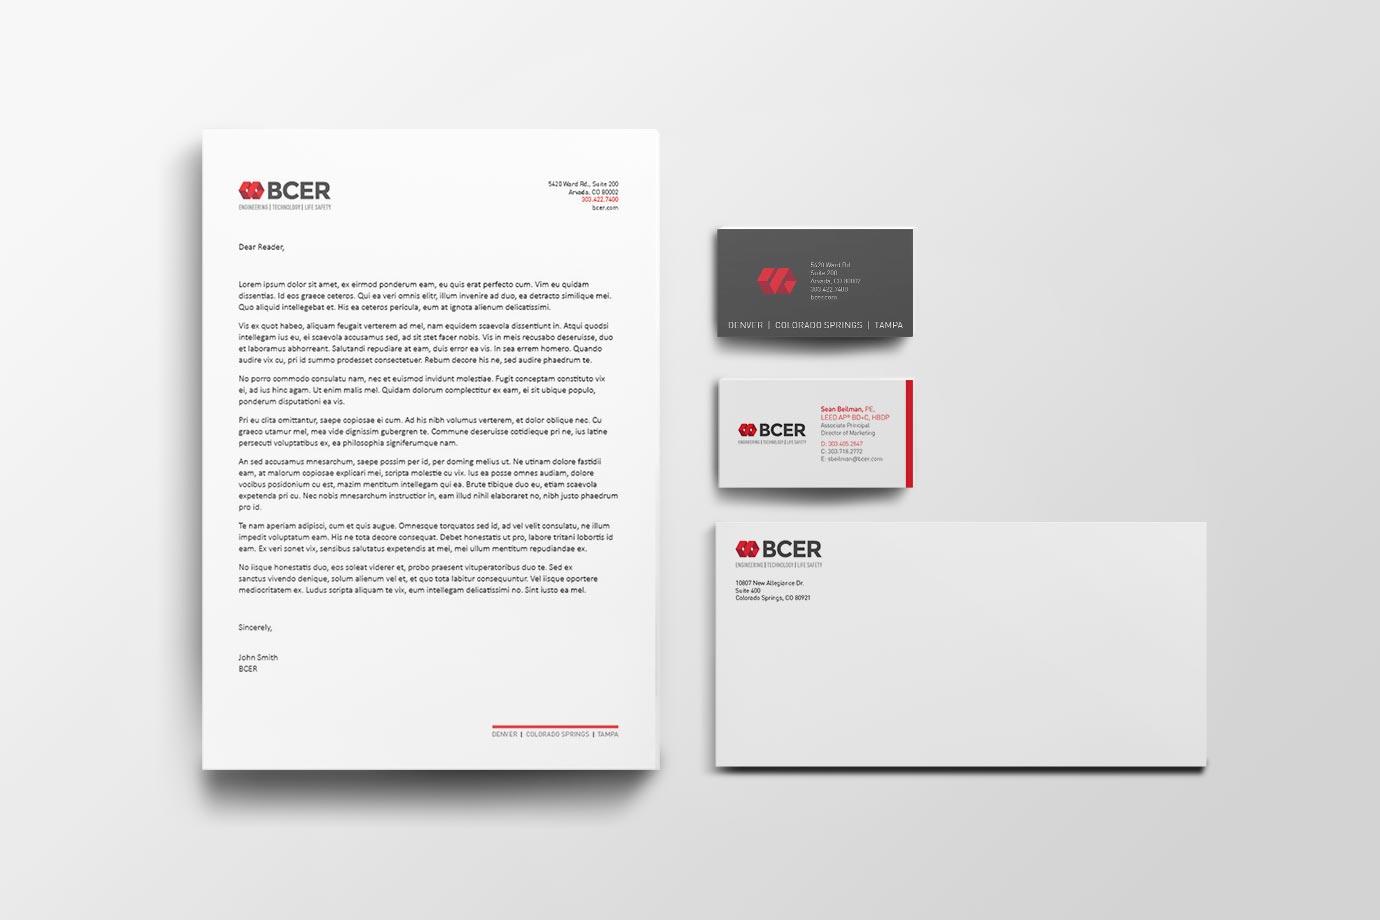 BON_BCR identity_spread.jpg